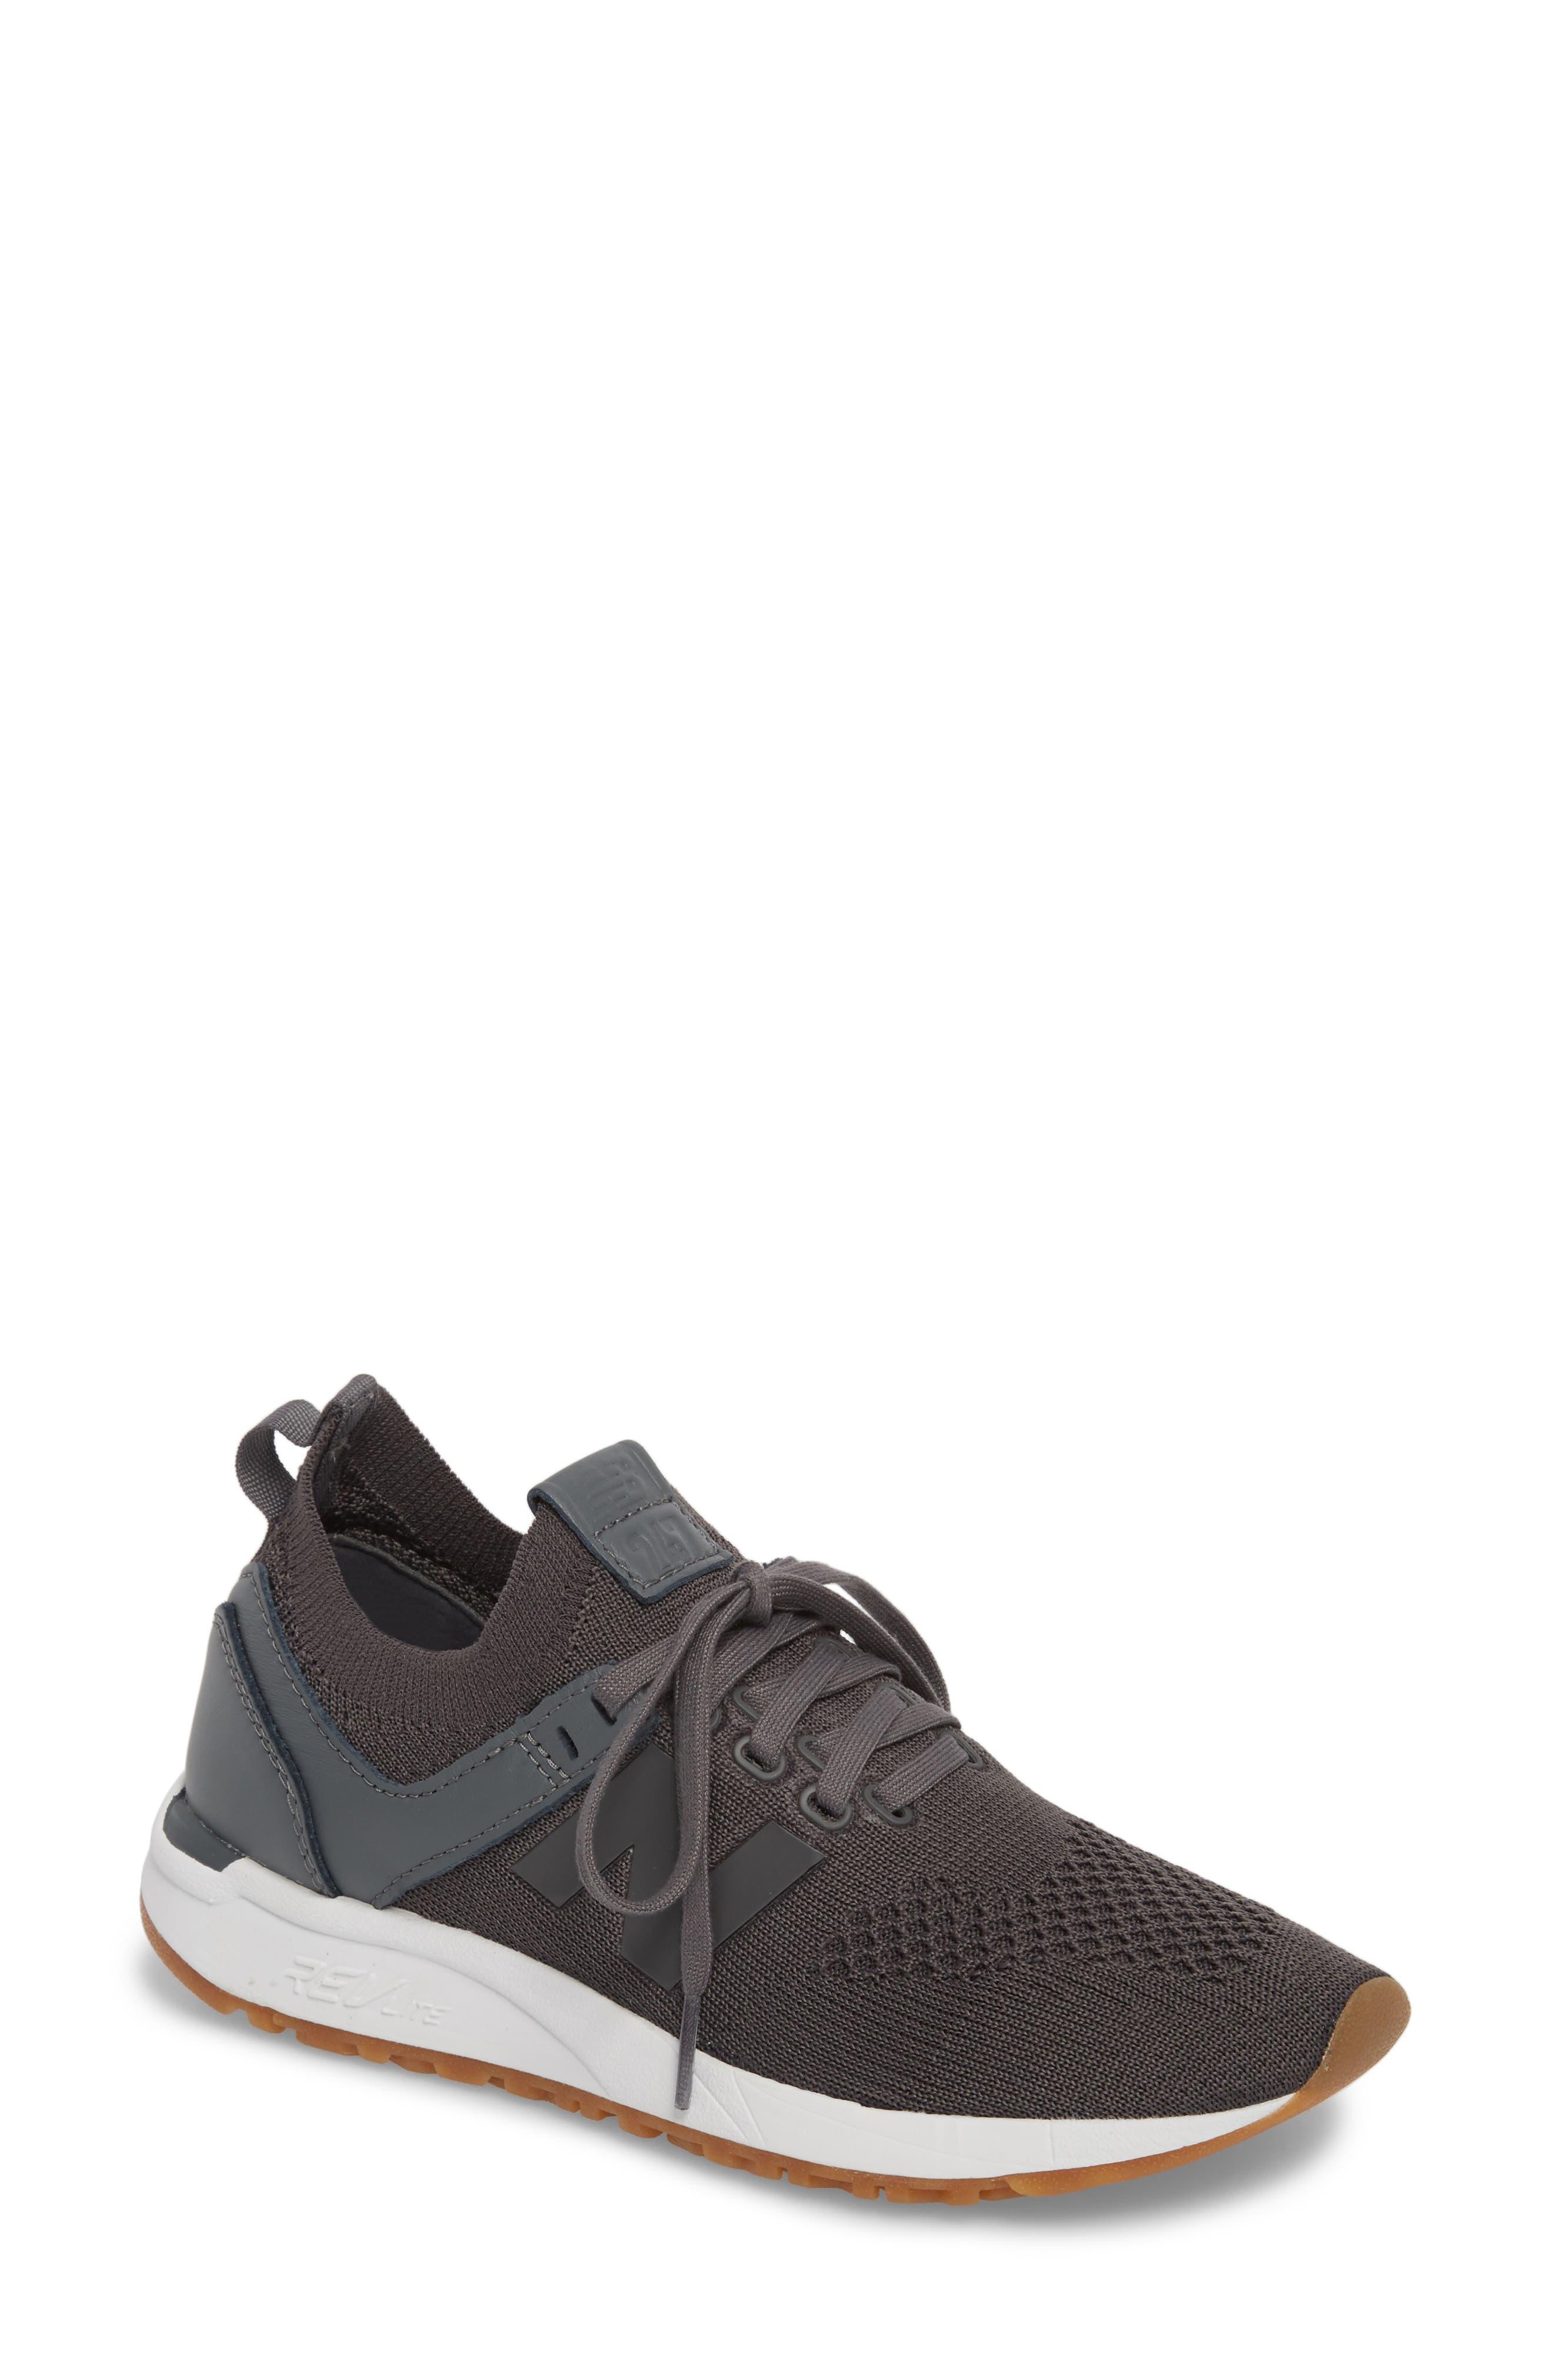 247 Decon Knit Sneaker,                         Main,                         color, 030